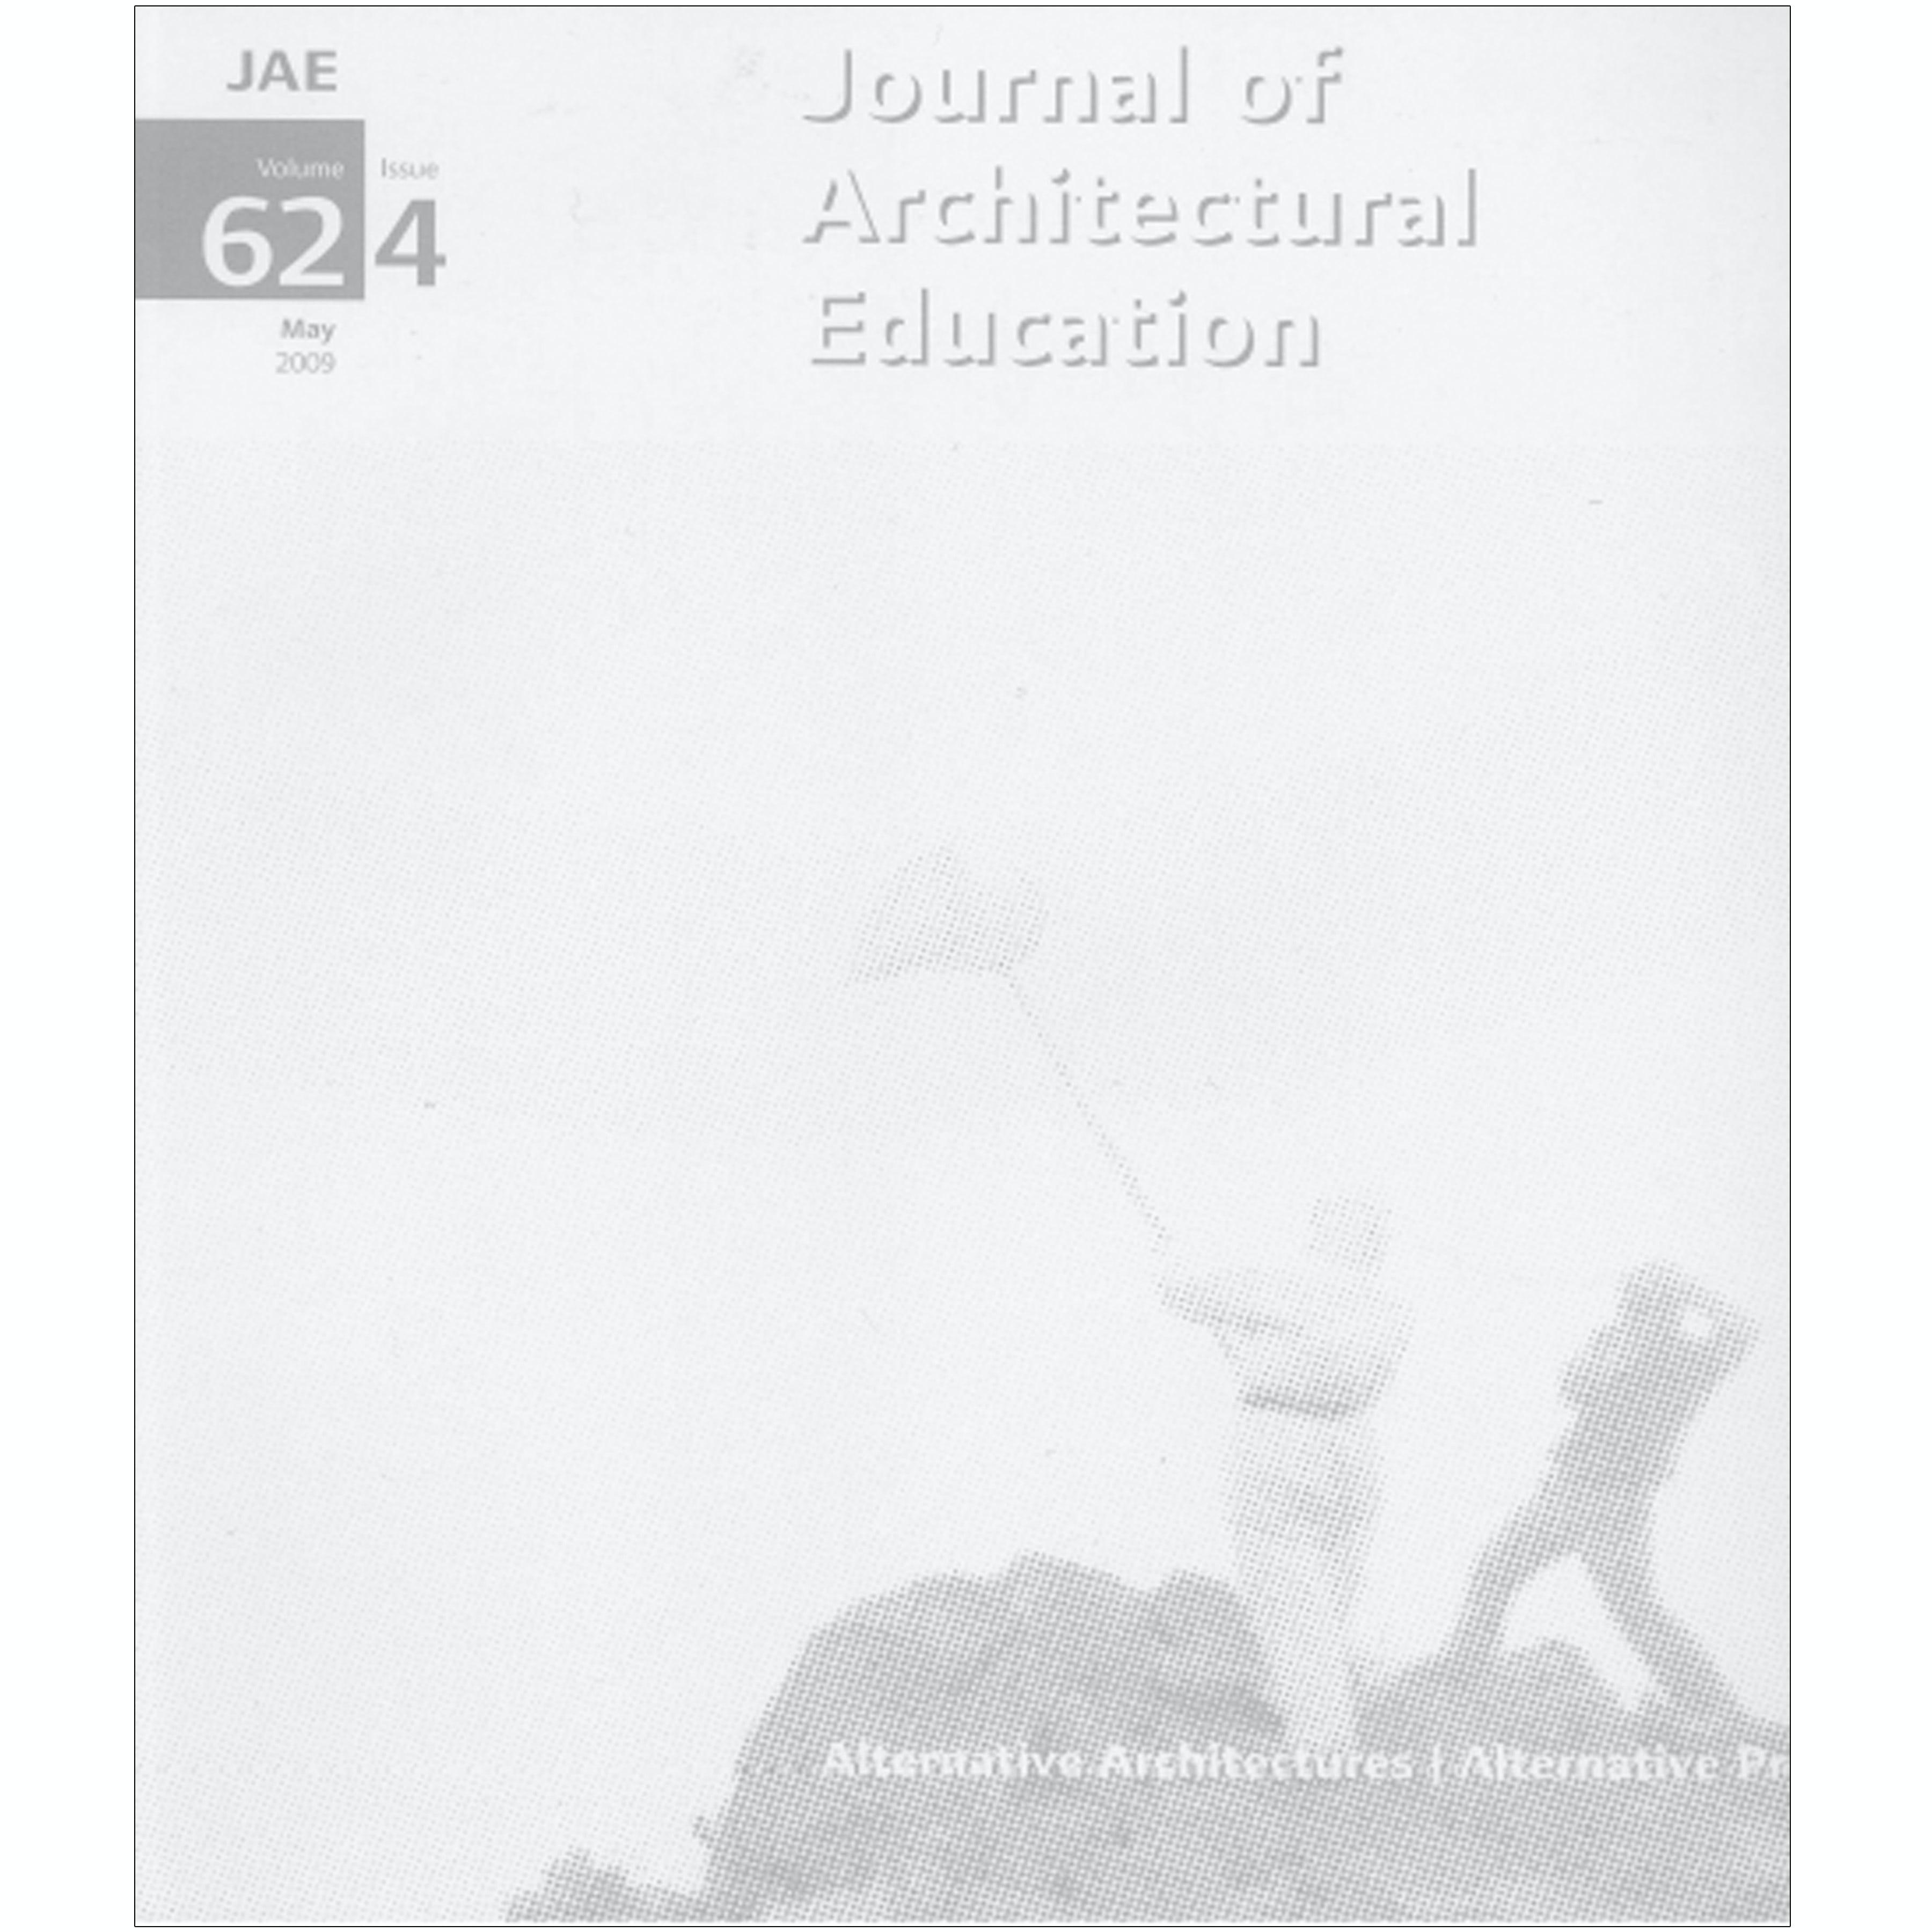 Rvtr jae 62 issue 04